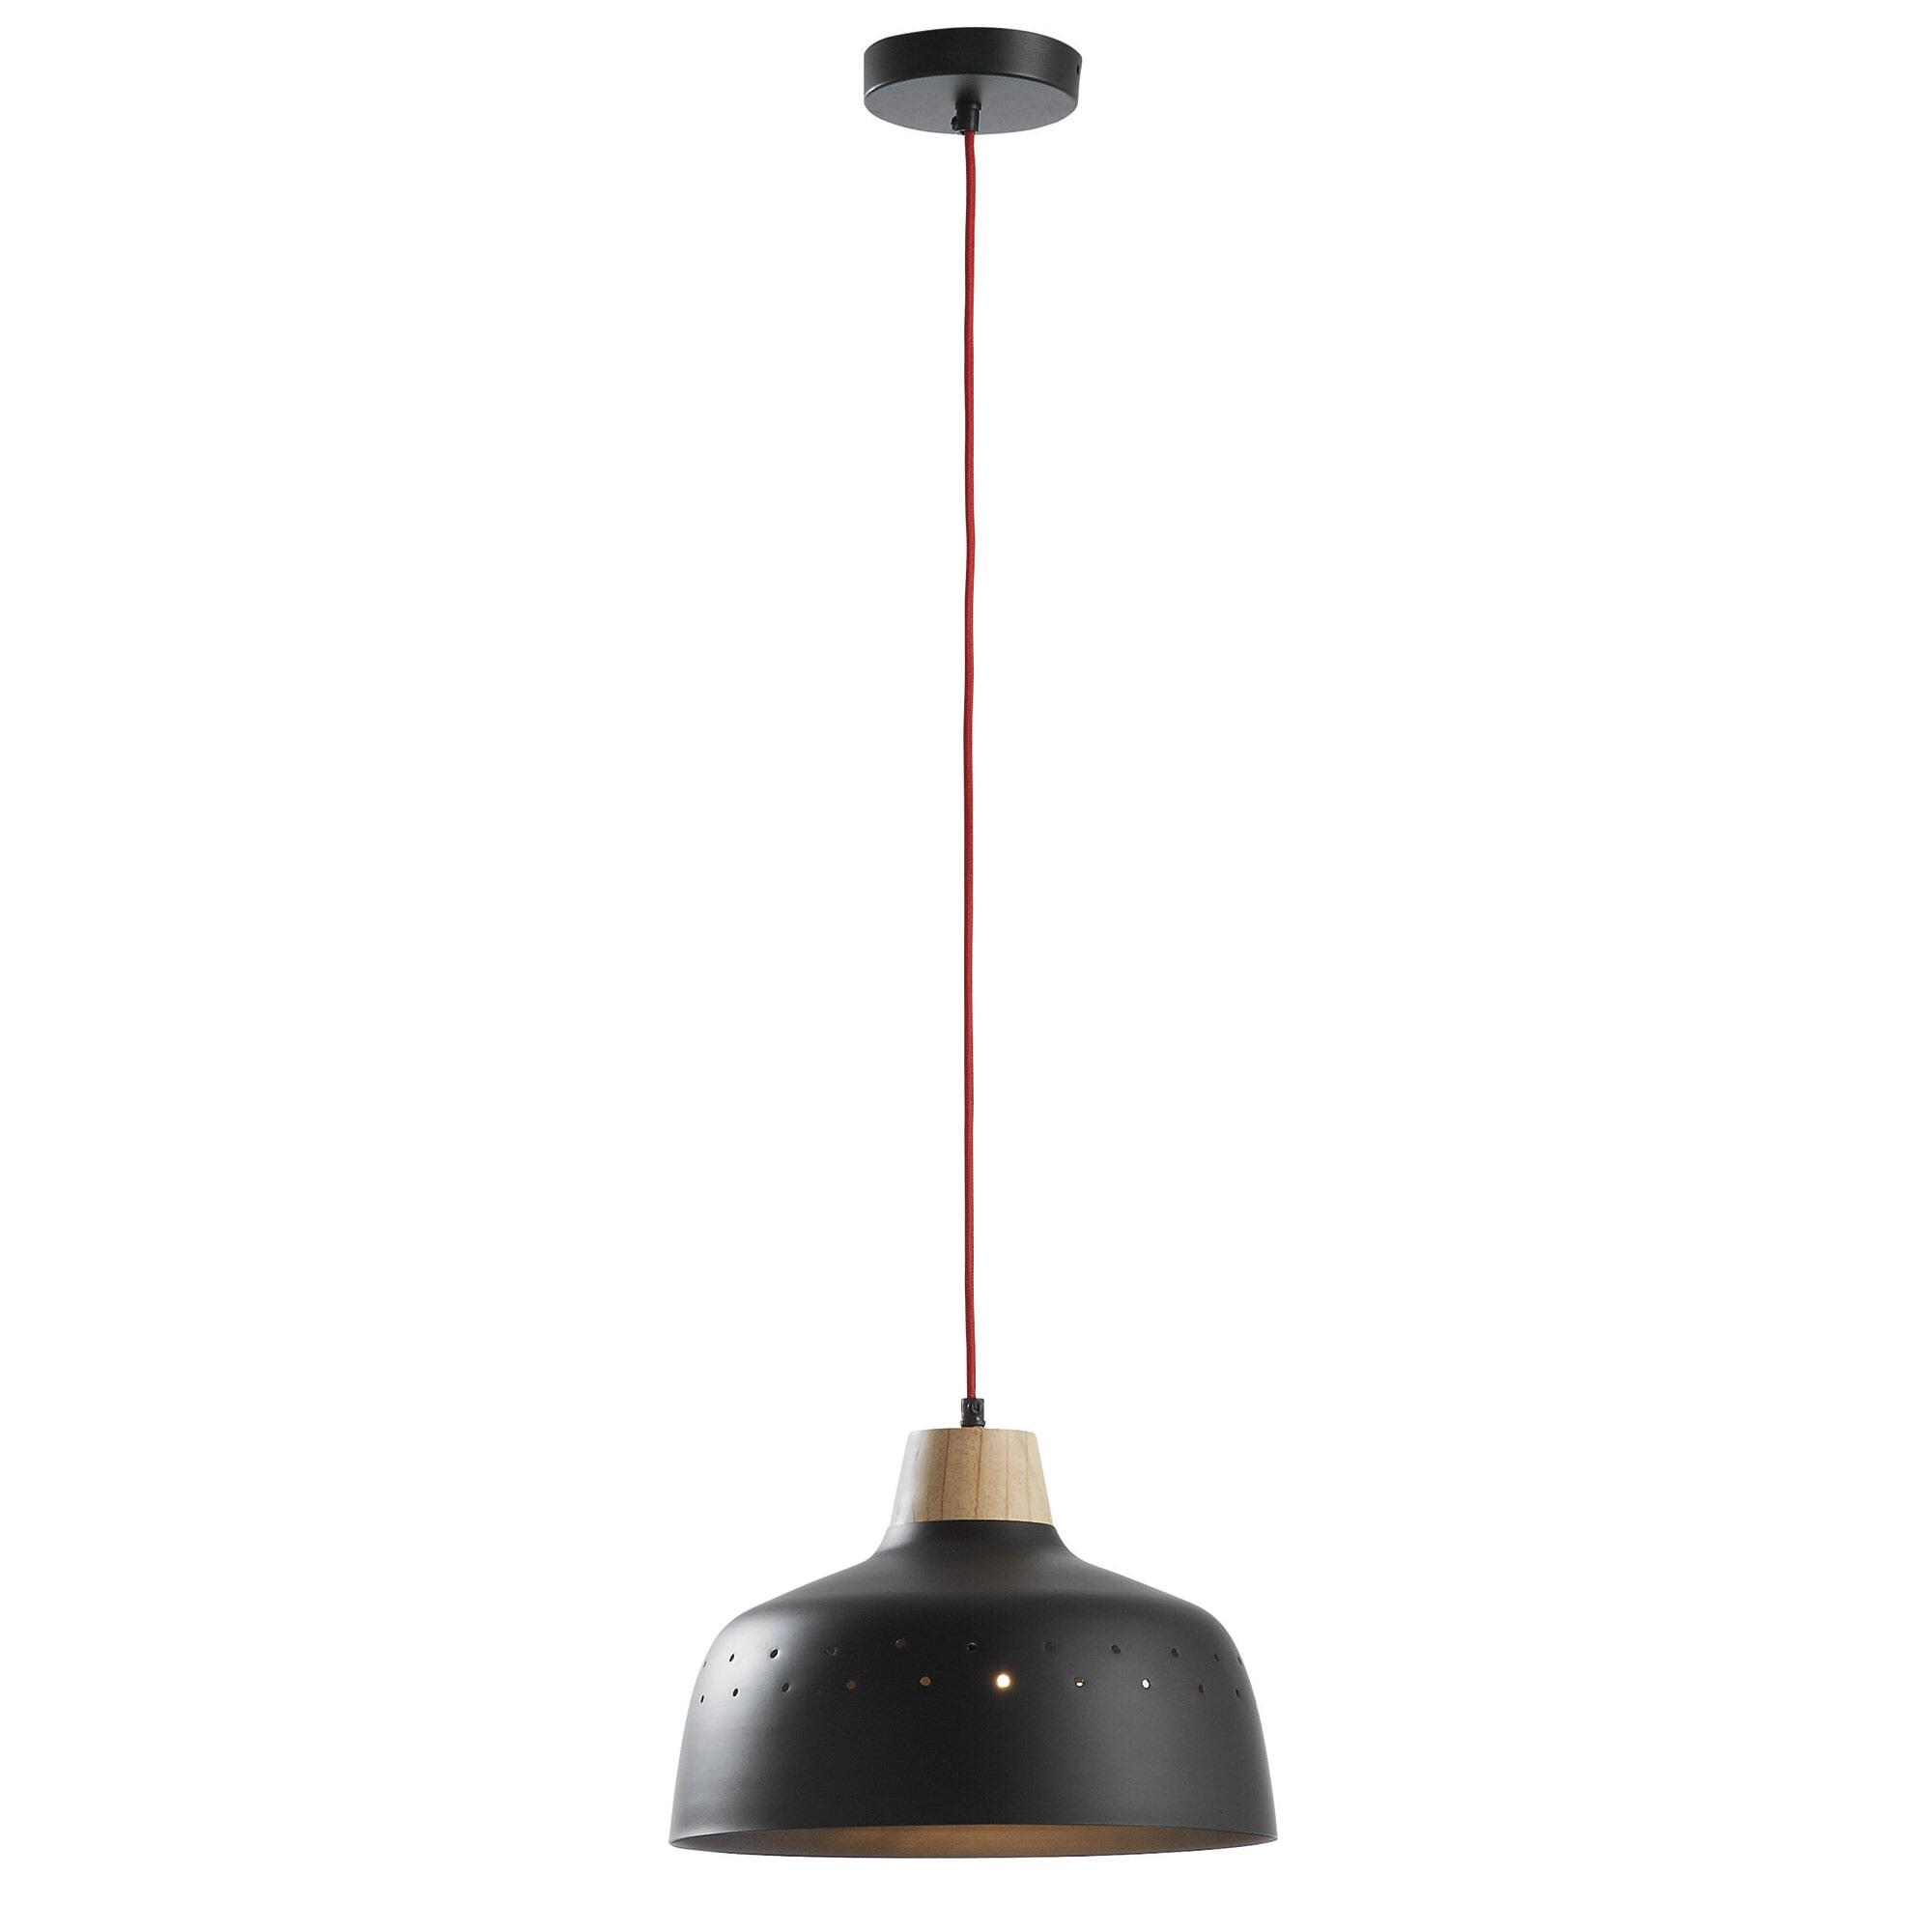 Kave Home Hanglamp 'Bits', kleur zwart